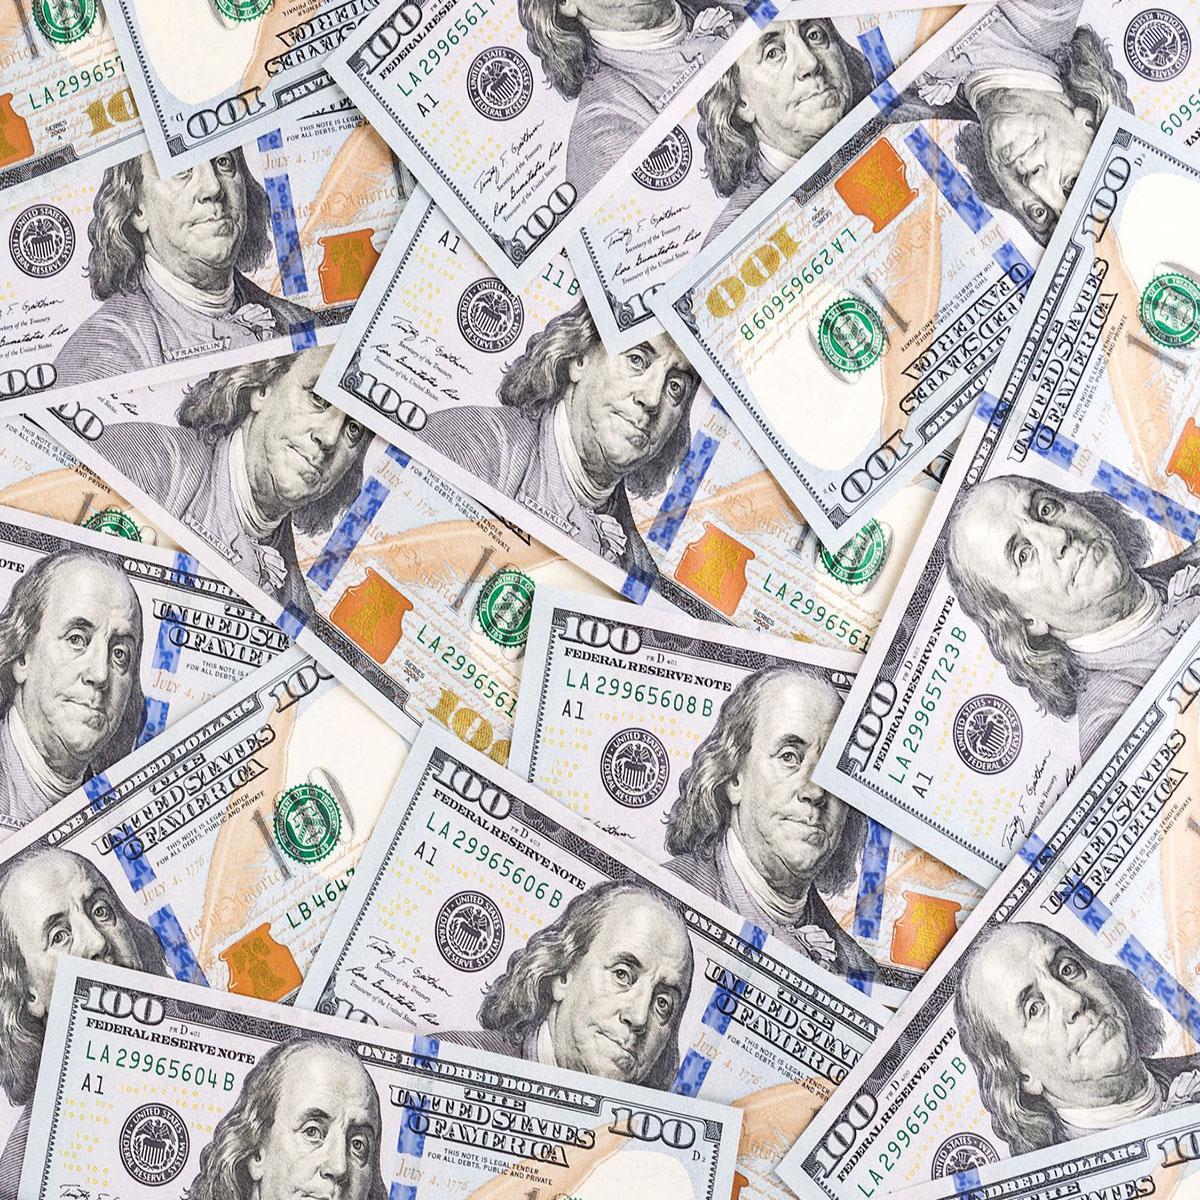 6 BANKNOTES EL SALVADOR STRONGLY CIRCULATED IN DIFFERENT DECADES